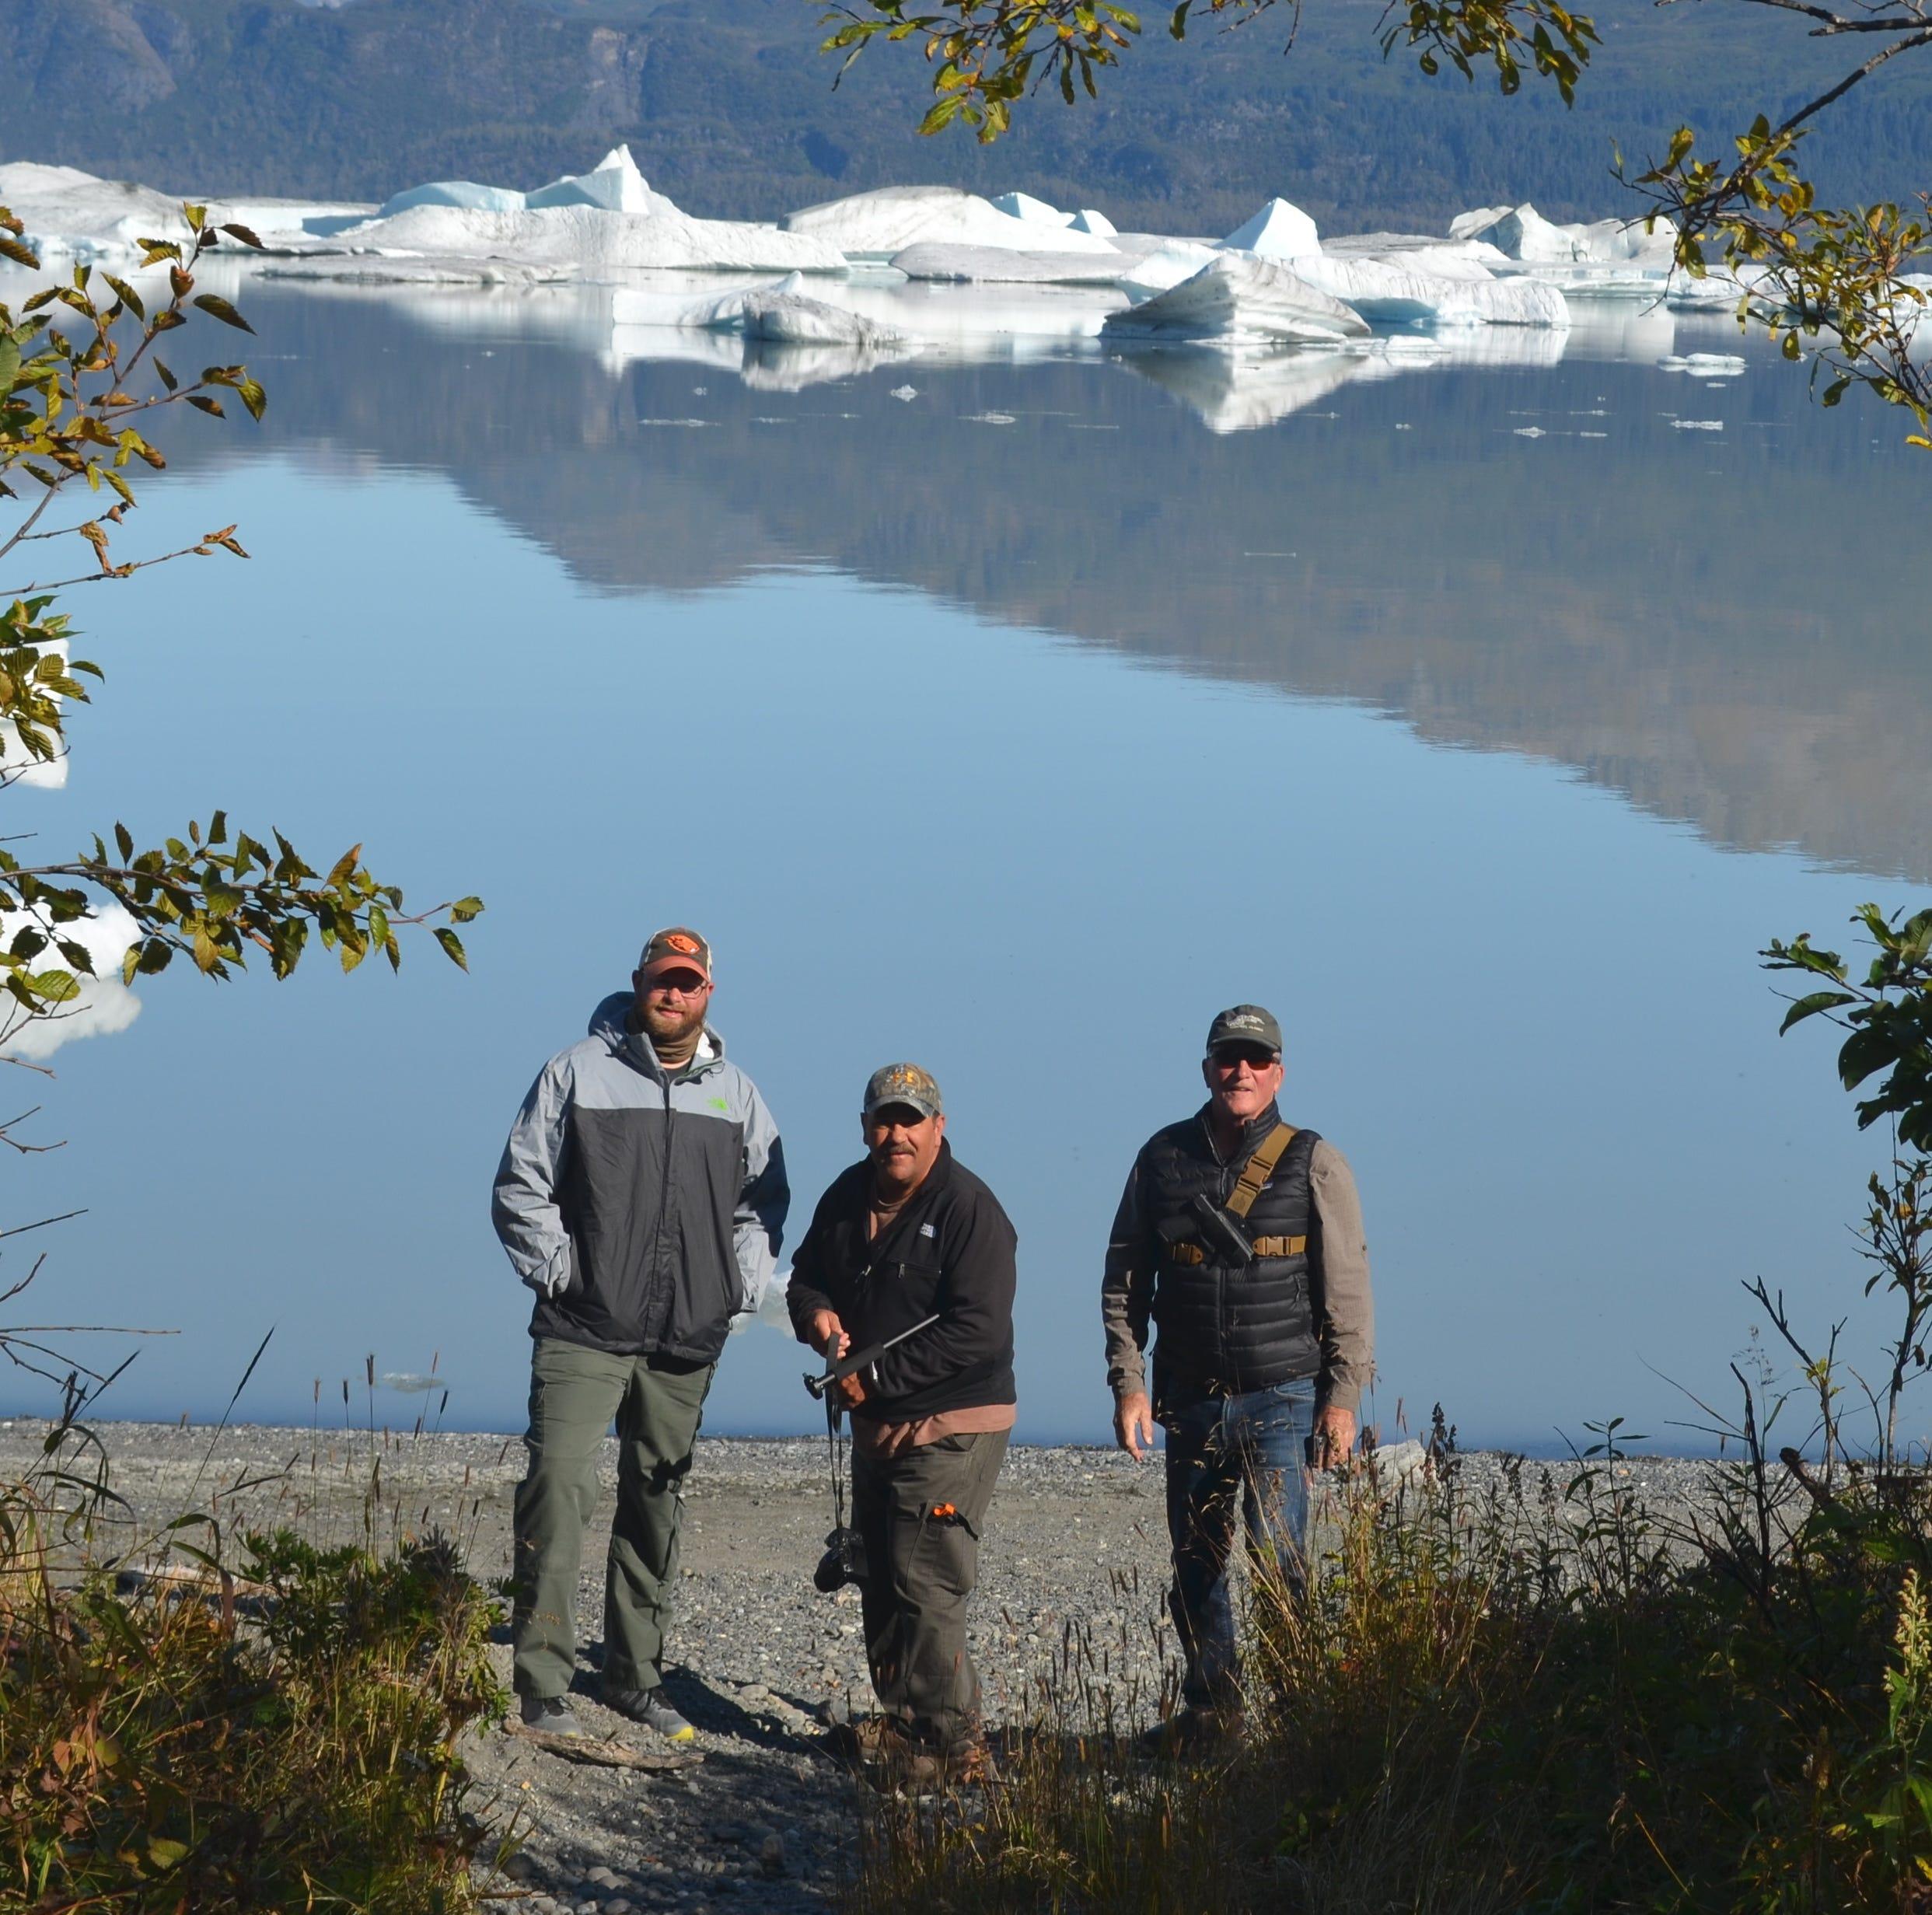 Miller: Bears more plentiful than fish during Alaskan fishing trip